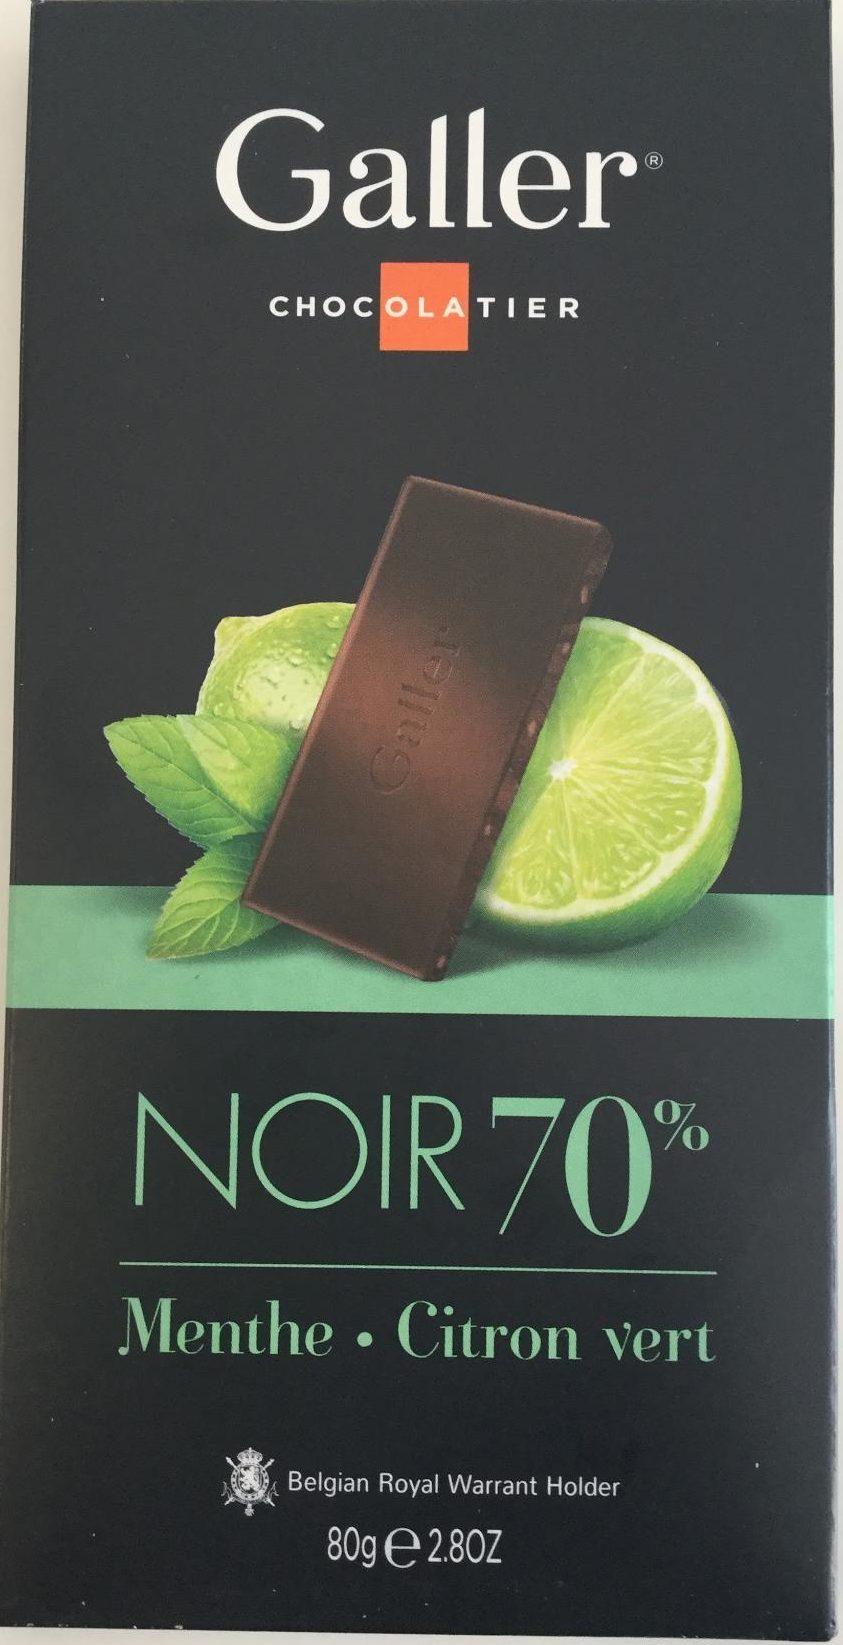 Chocolat Noir Menthe - Citron vert - Product - fr